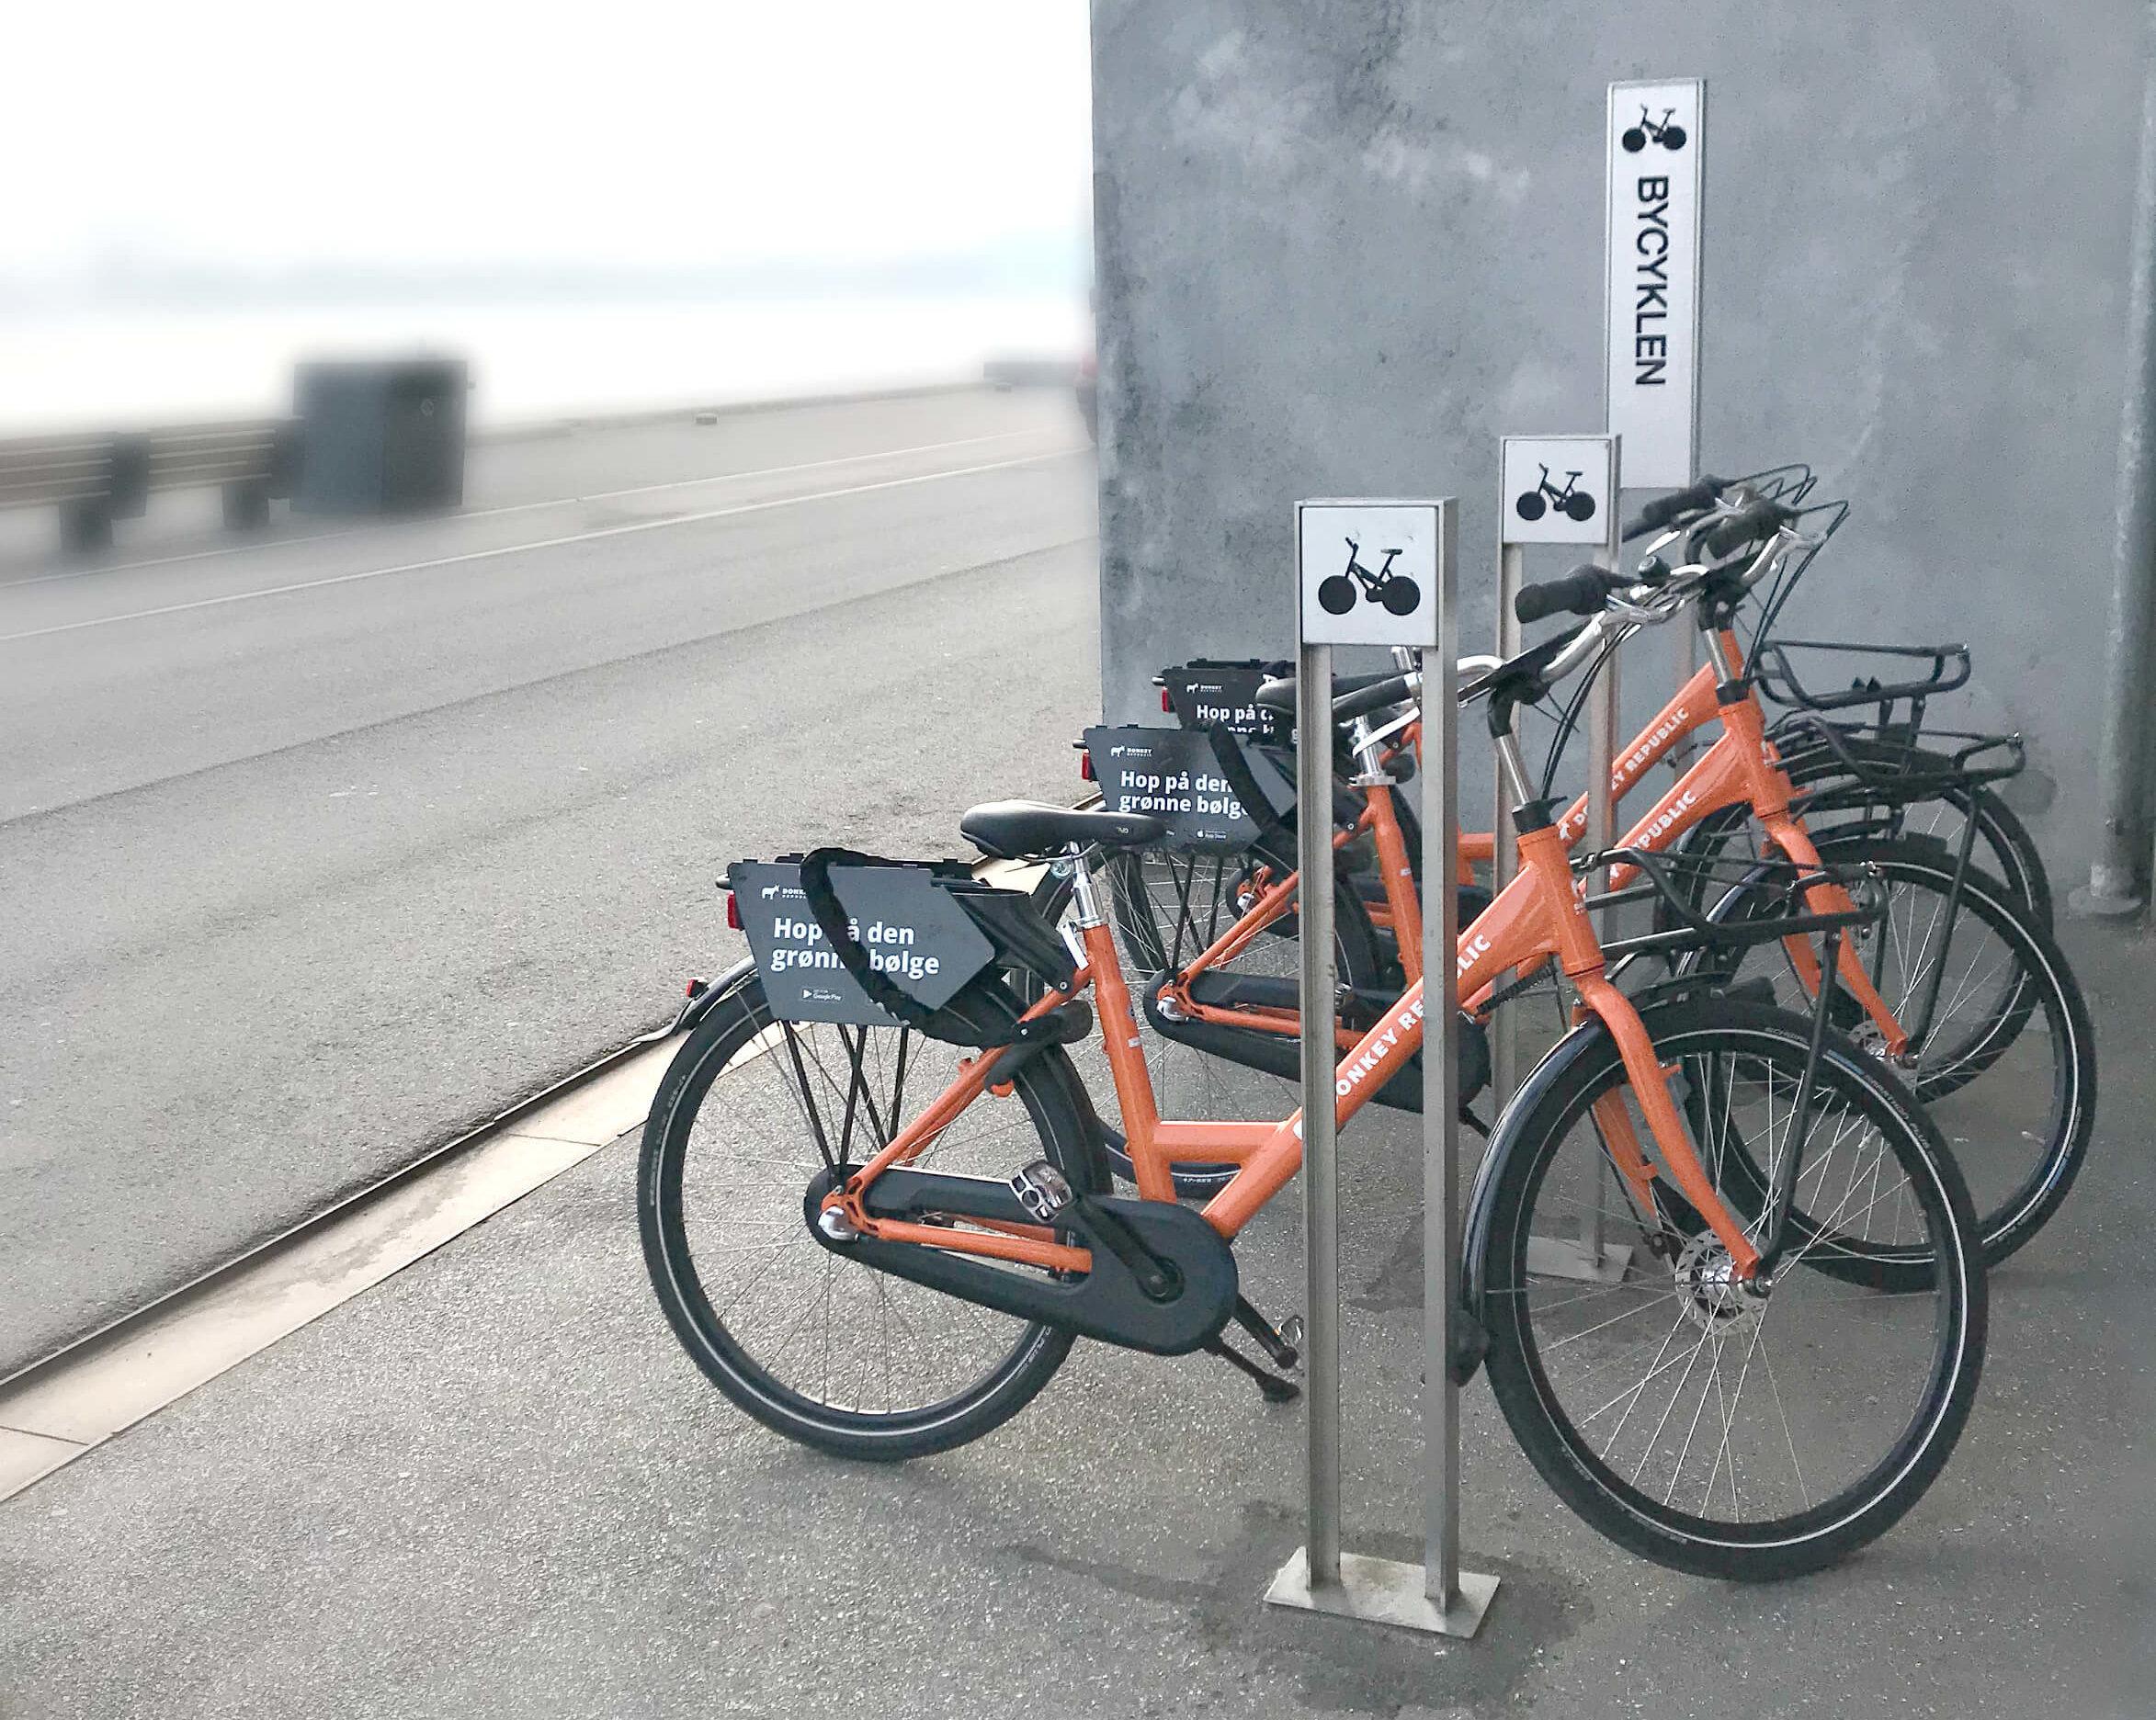 Det her elsker jeg - Donkey Republic city cykler